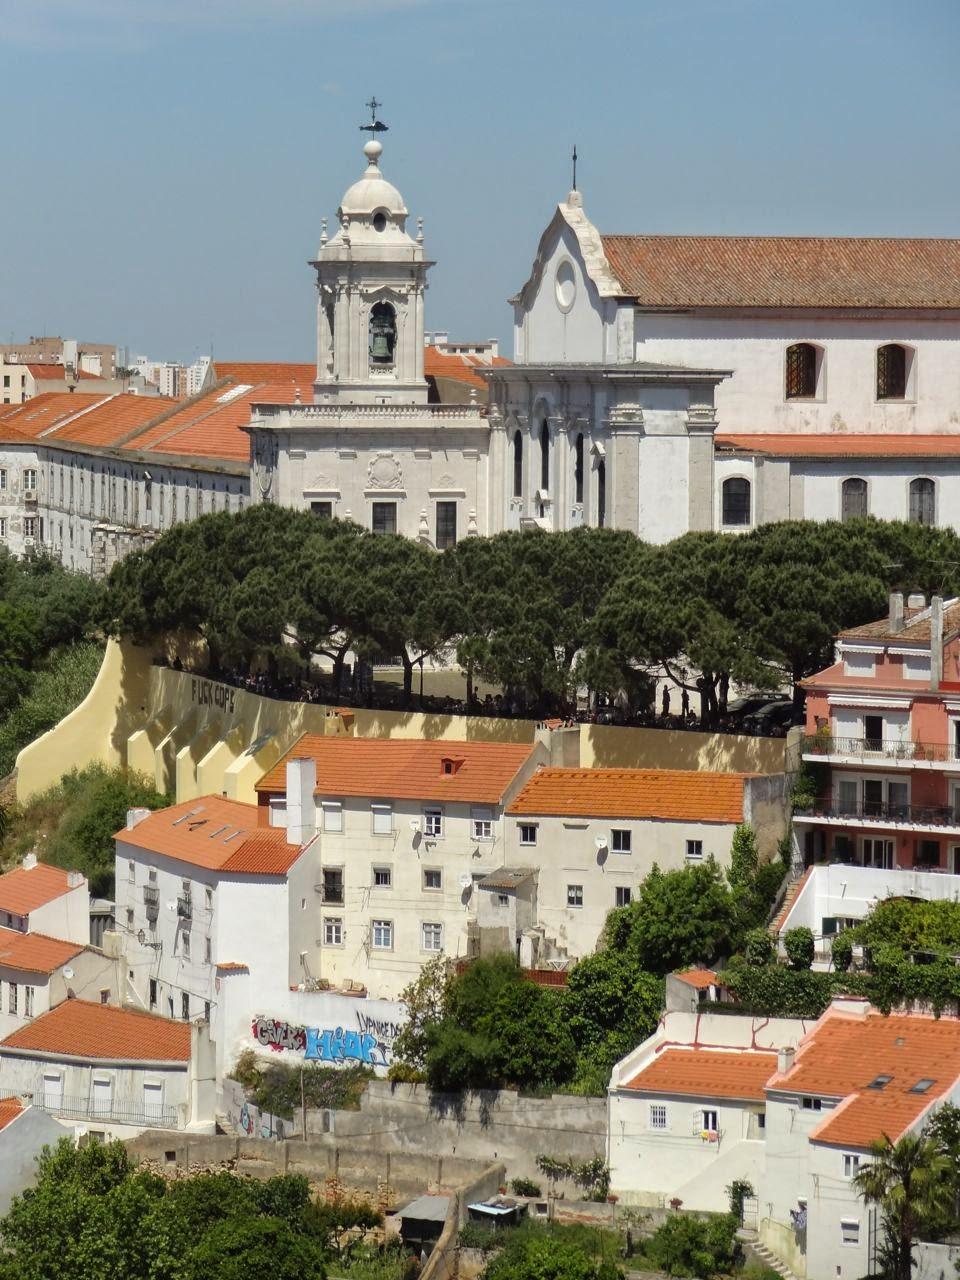 Alfama - the original Moorish district of Lisbon 5